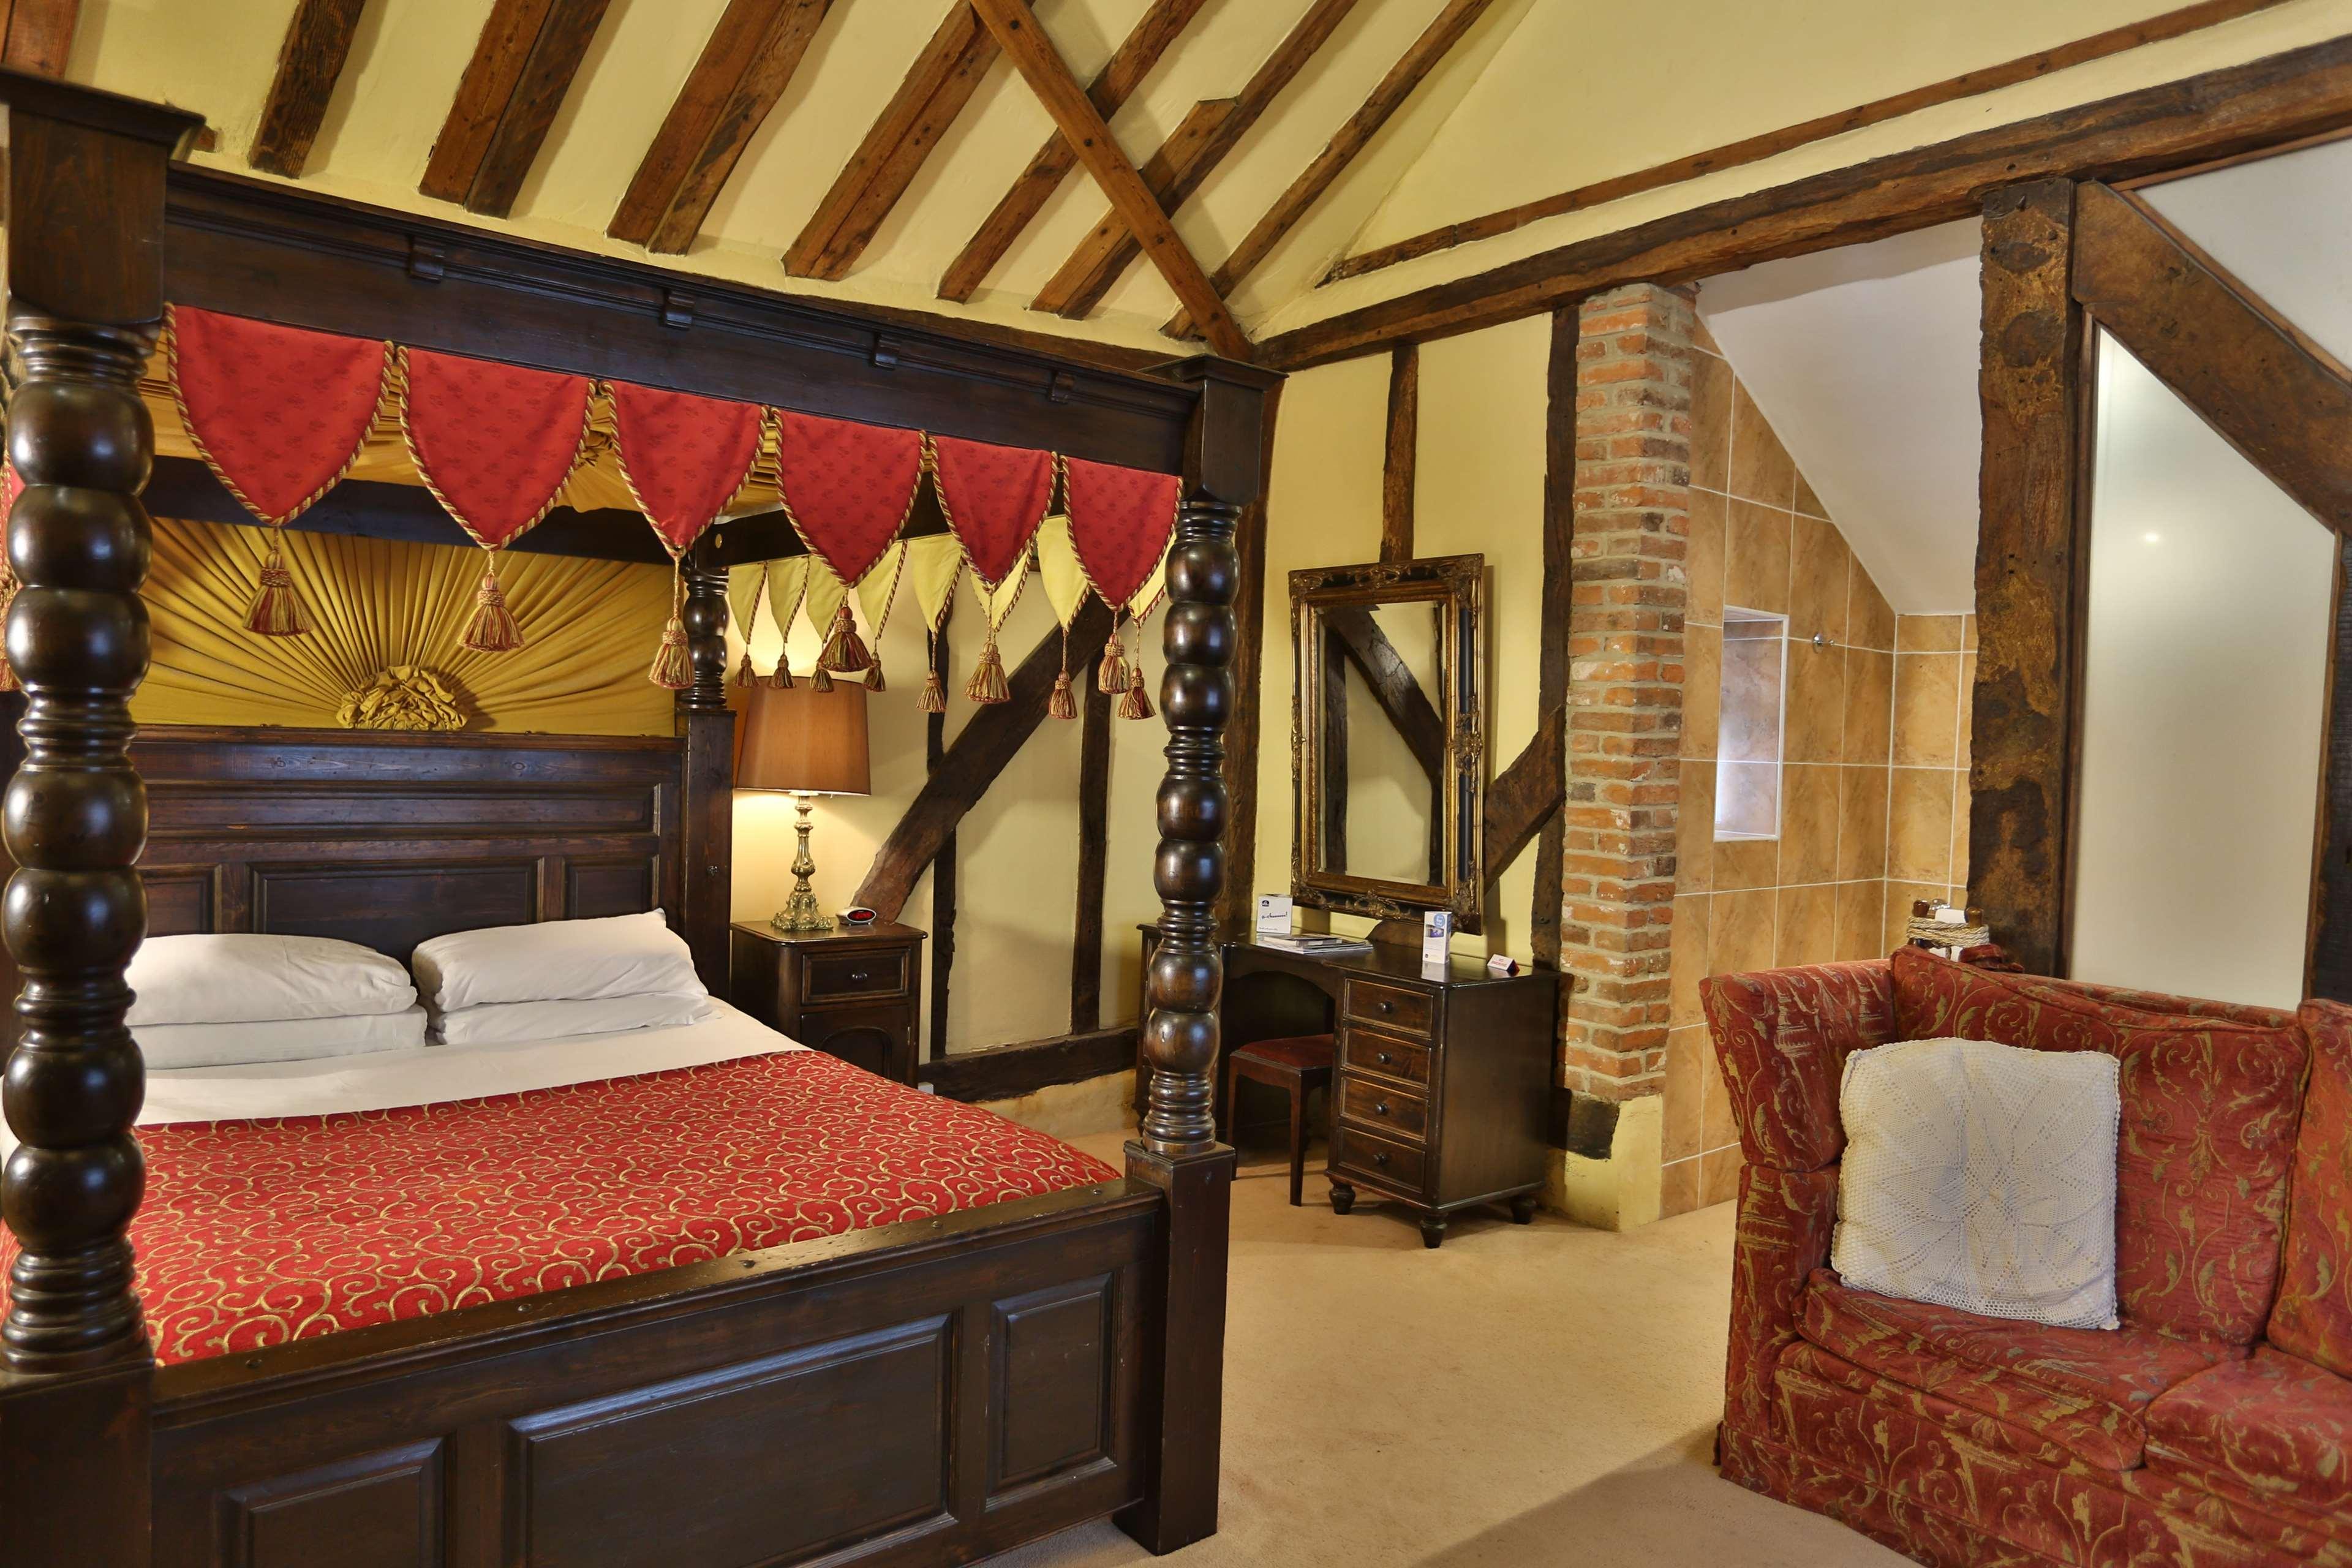 Superior Room In Brome Grange Hotel